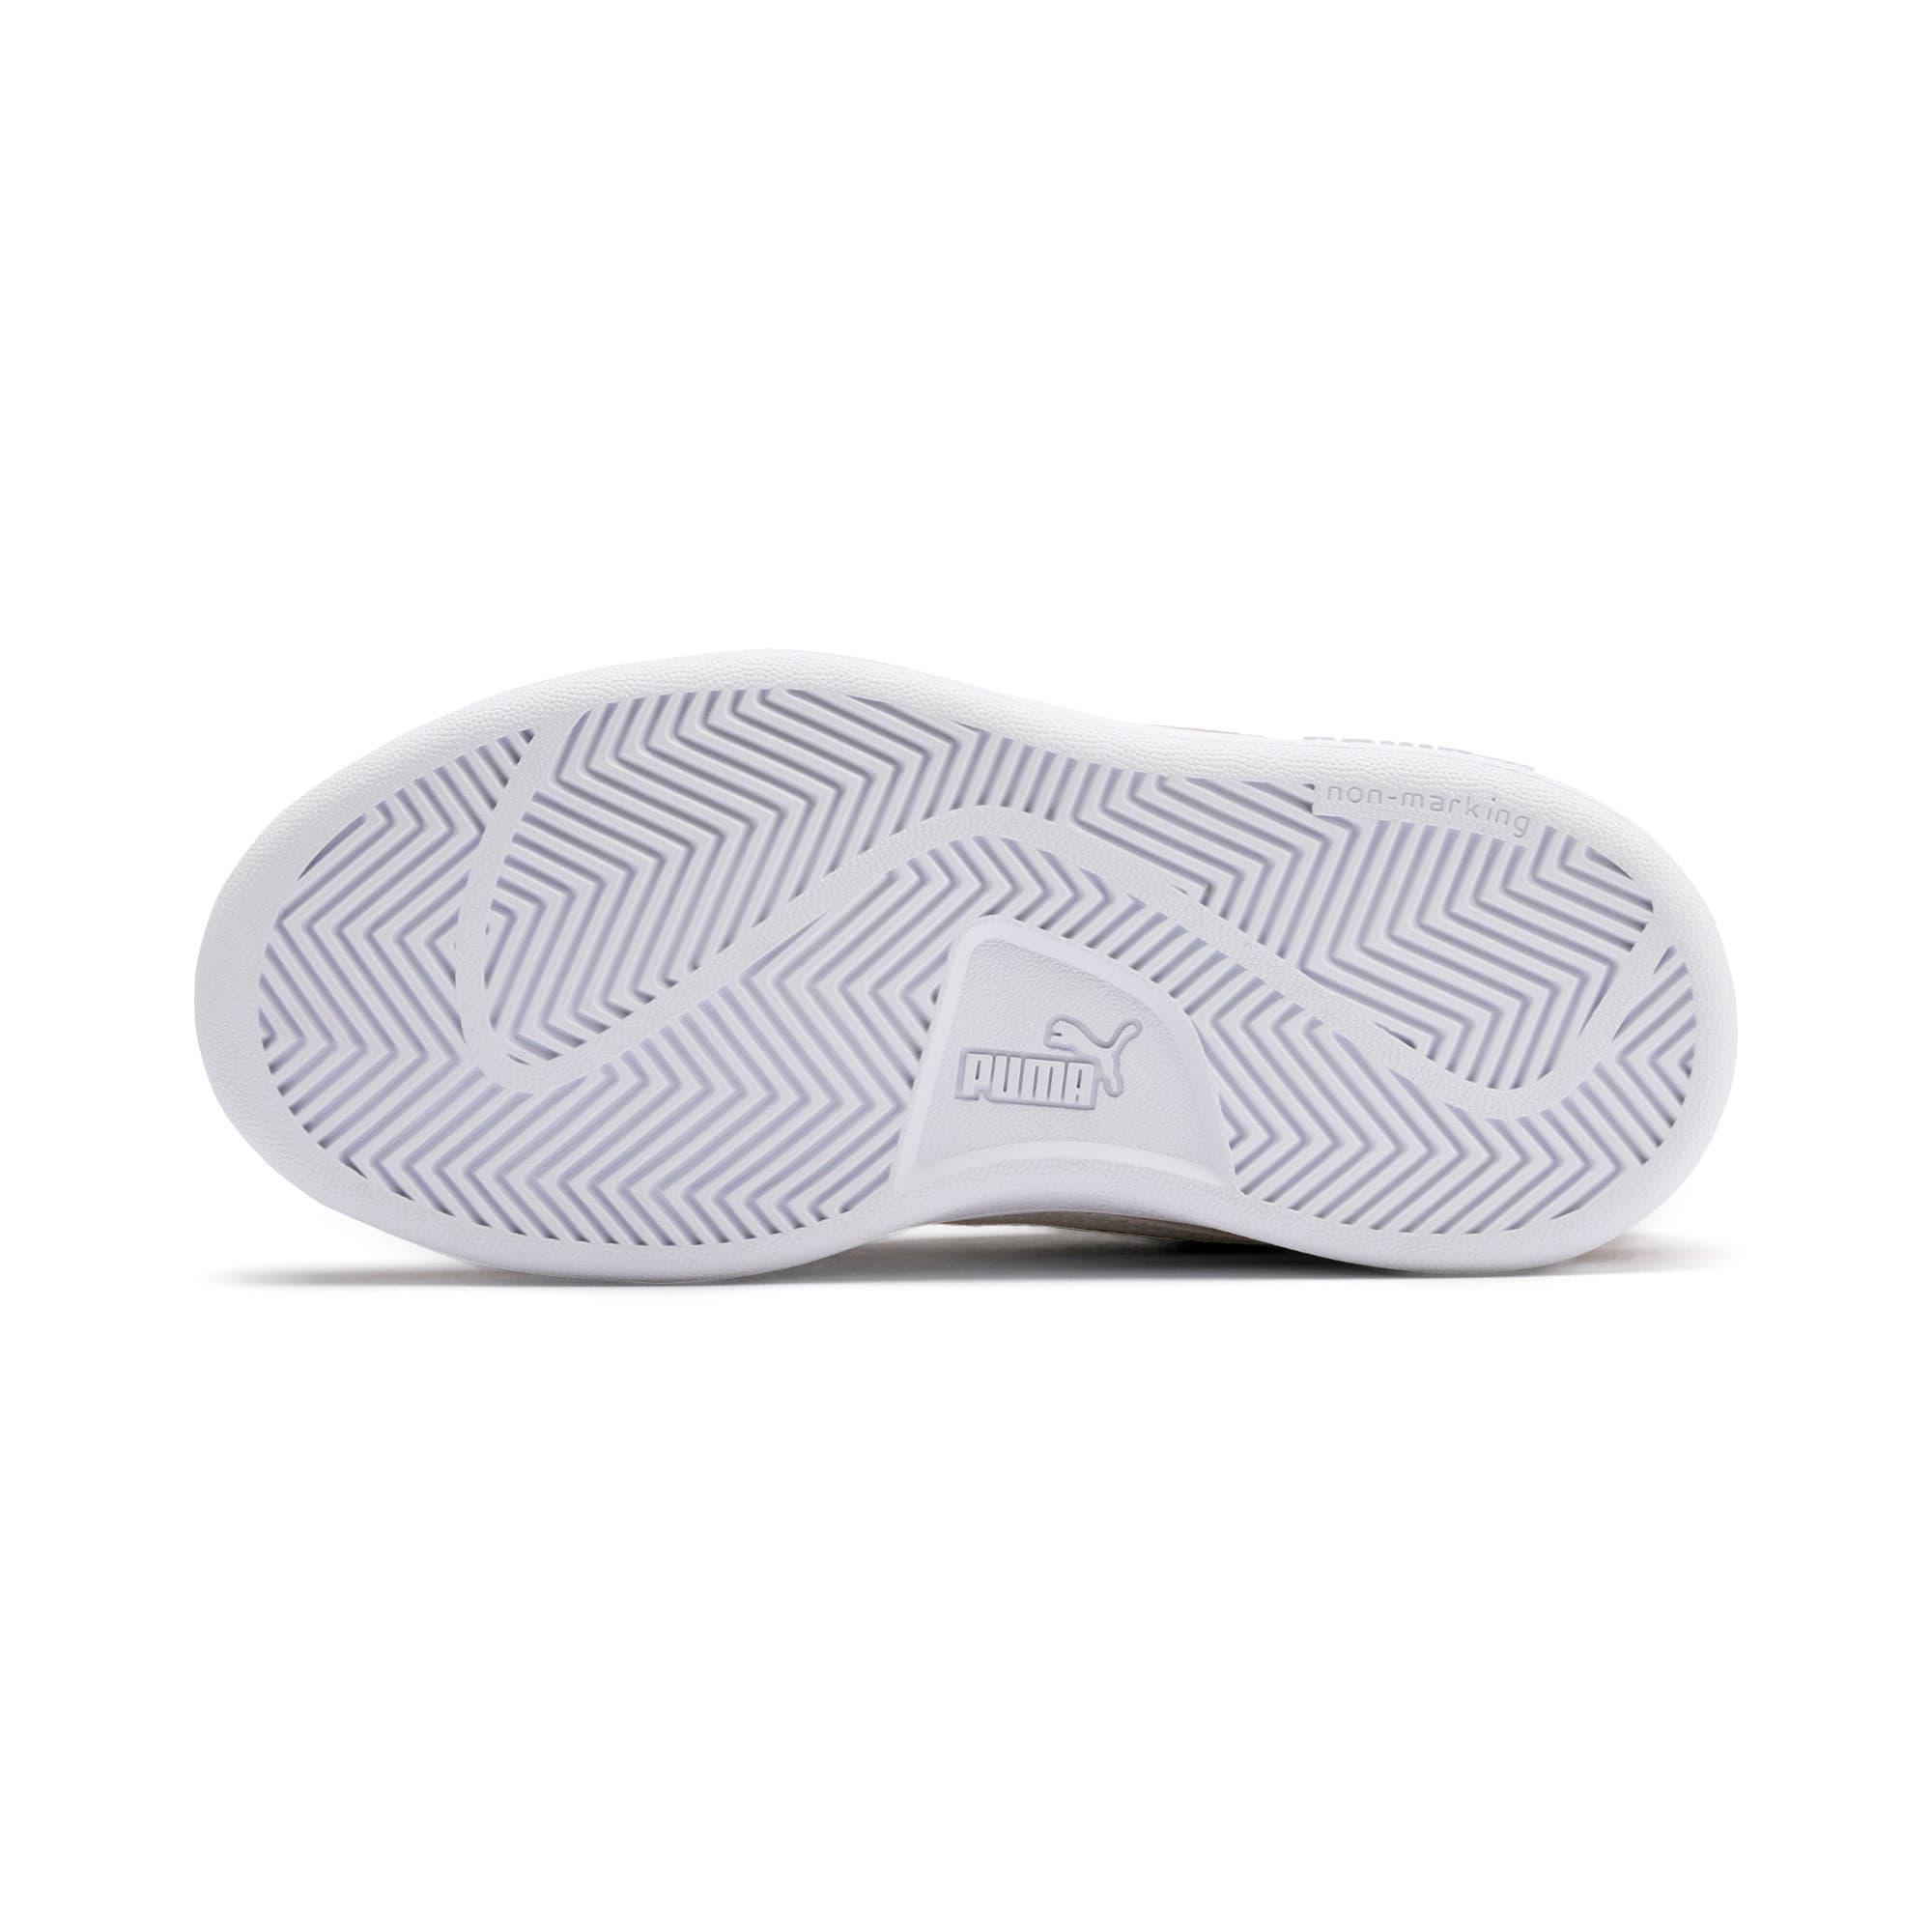 Thumbnail 4 of Smash v2 Suede Little Kids' Shoes, Rhubarb-Puma White, medium